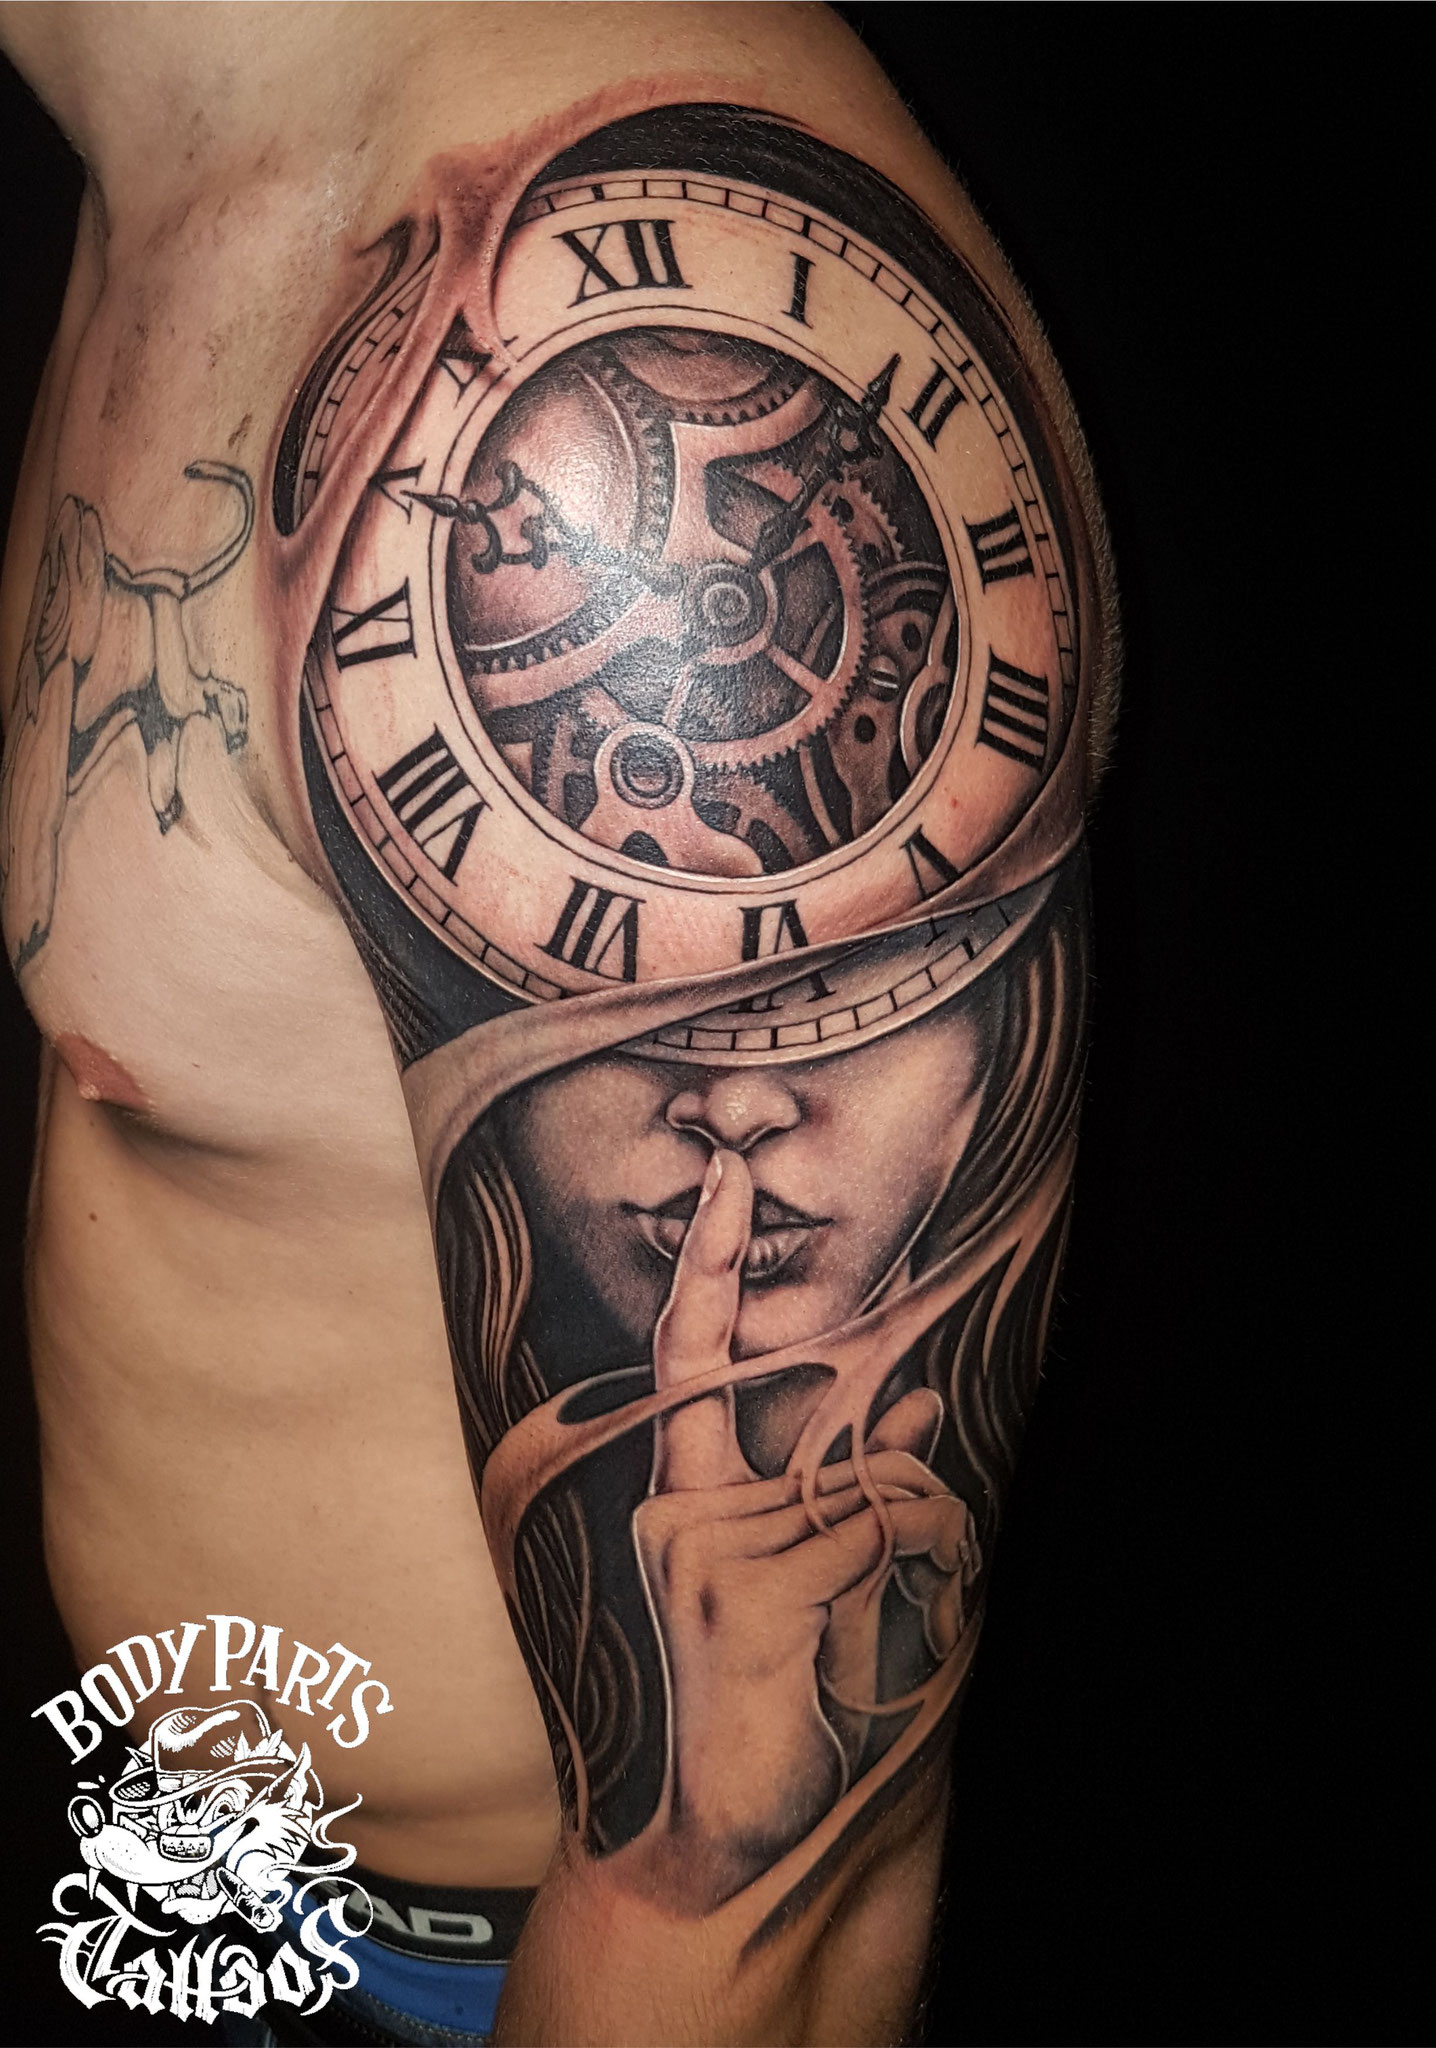 Black & Grey / Schwarz Graue Tattoos